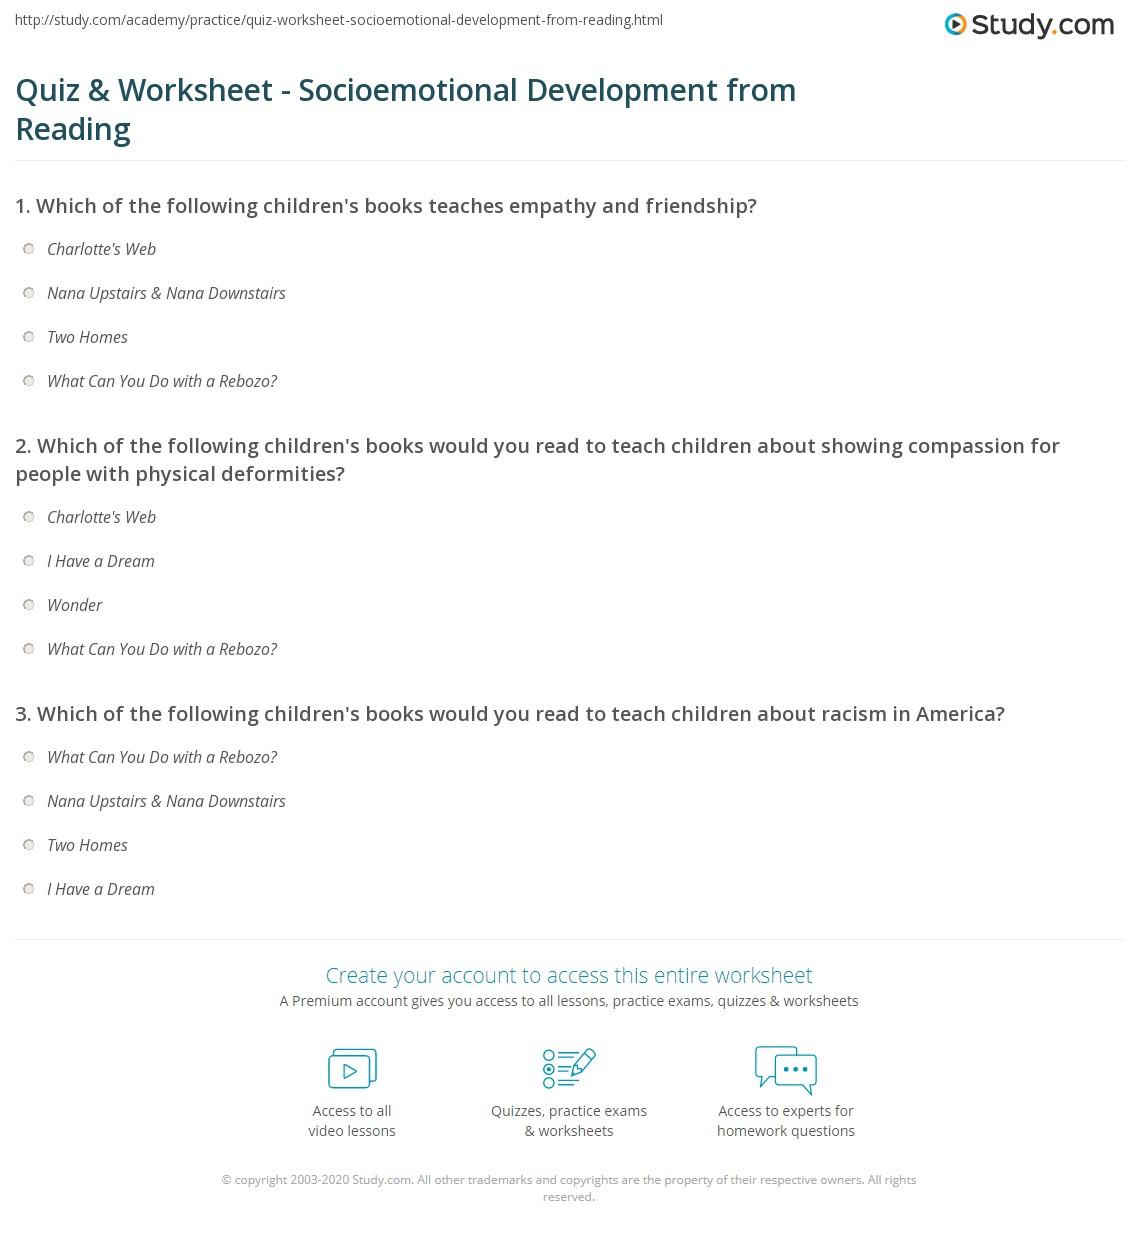 - Quiz & Worksheet - Socioemotional Development From Reading Study.com